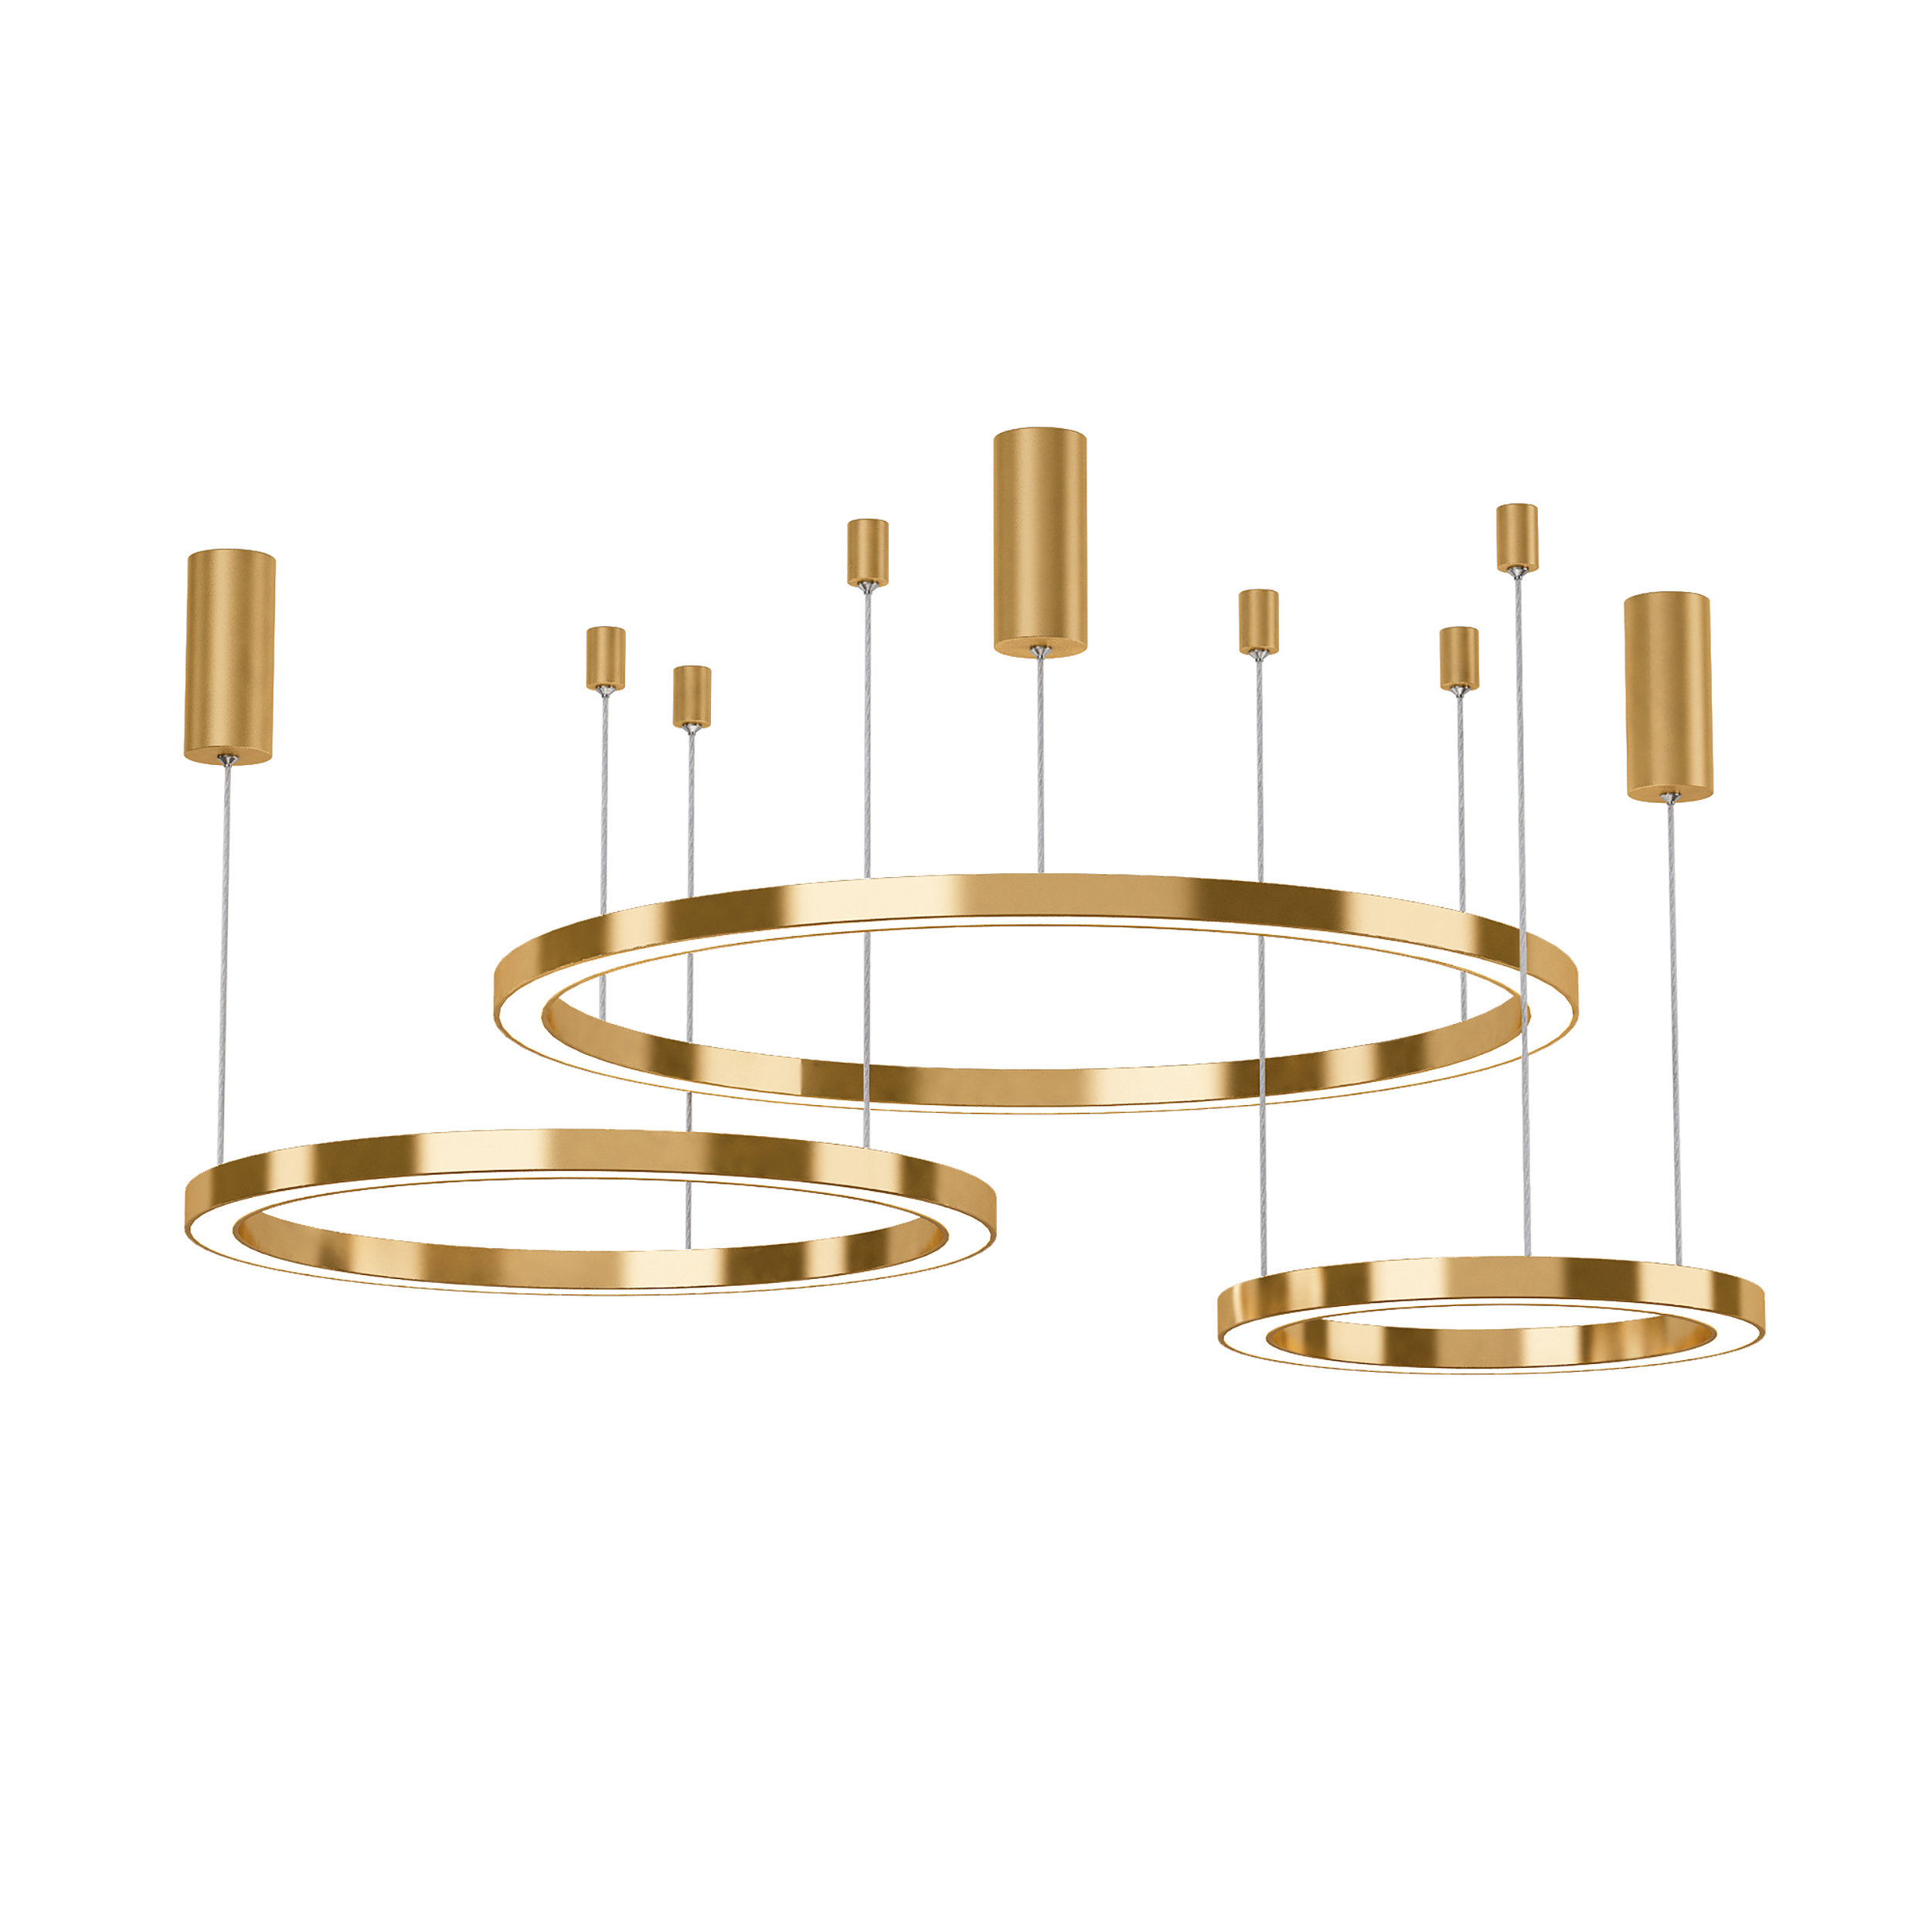 Postmodern Luxury Pendant Lights Brief 2019 New Nordic Style Art Hanglamp Creative Ring Living Room Lustre Pendant Lamp Lighting